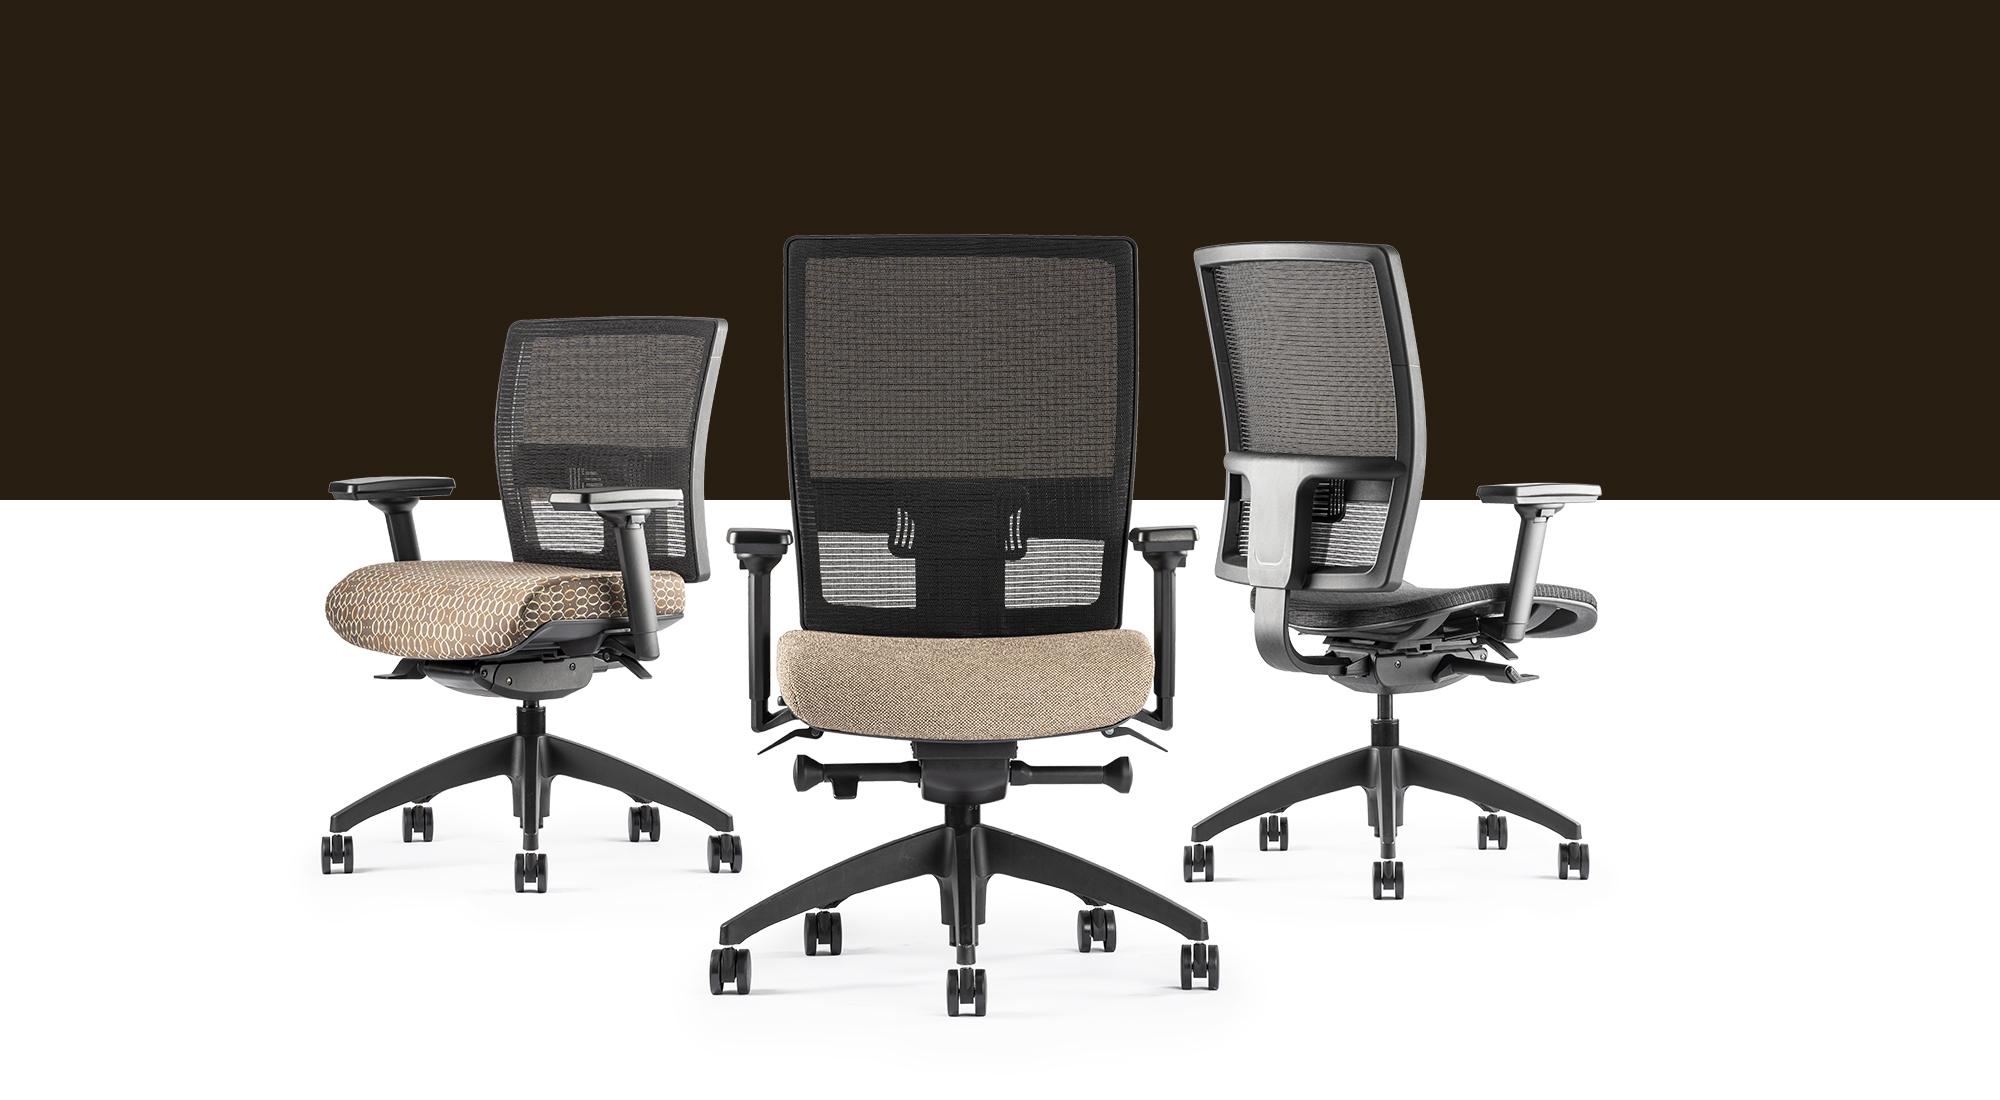 neutral posture ergonomic seating and accessories rh neutralposture com Neutral Posture Seating Neutral Posture Ergonomics